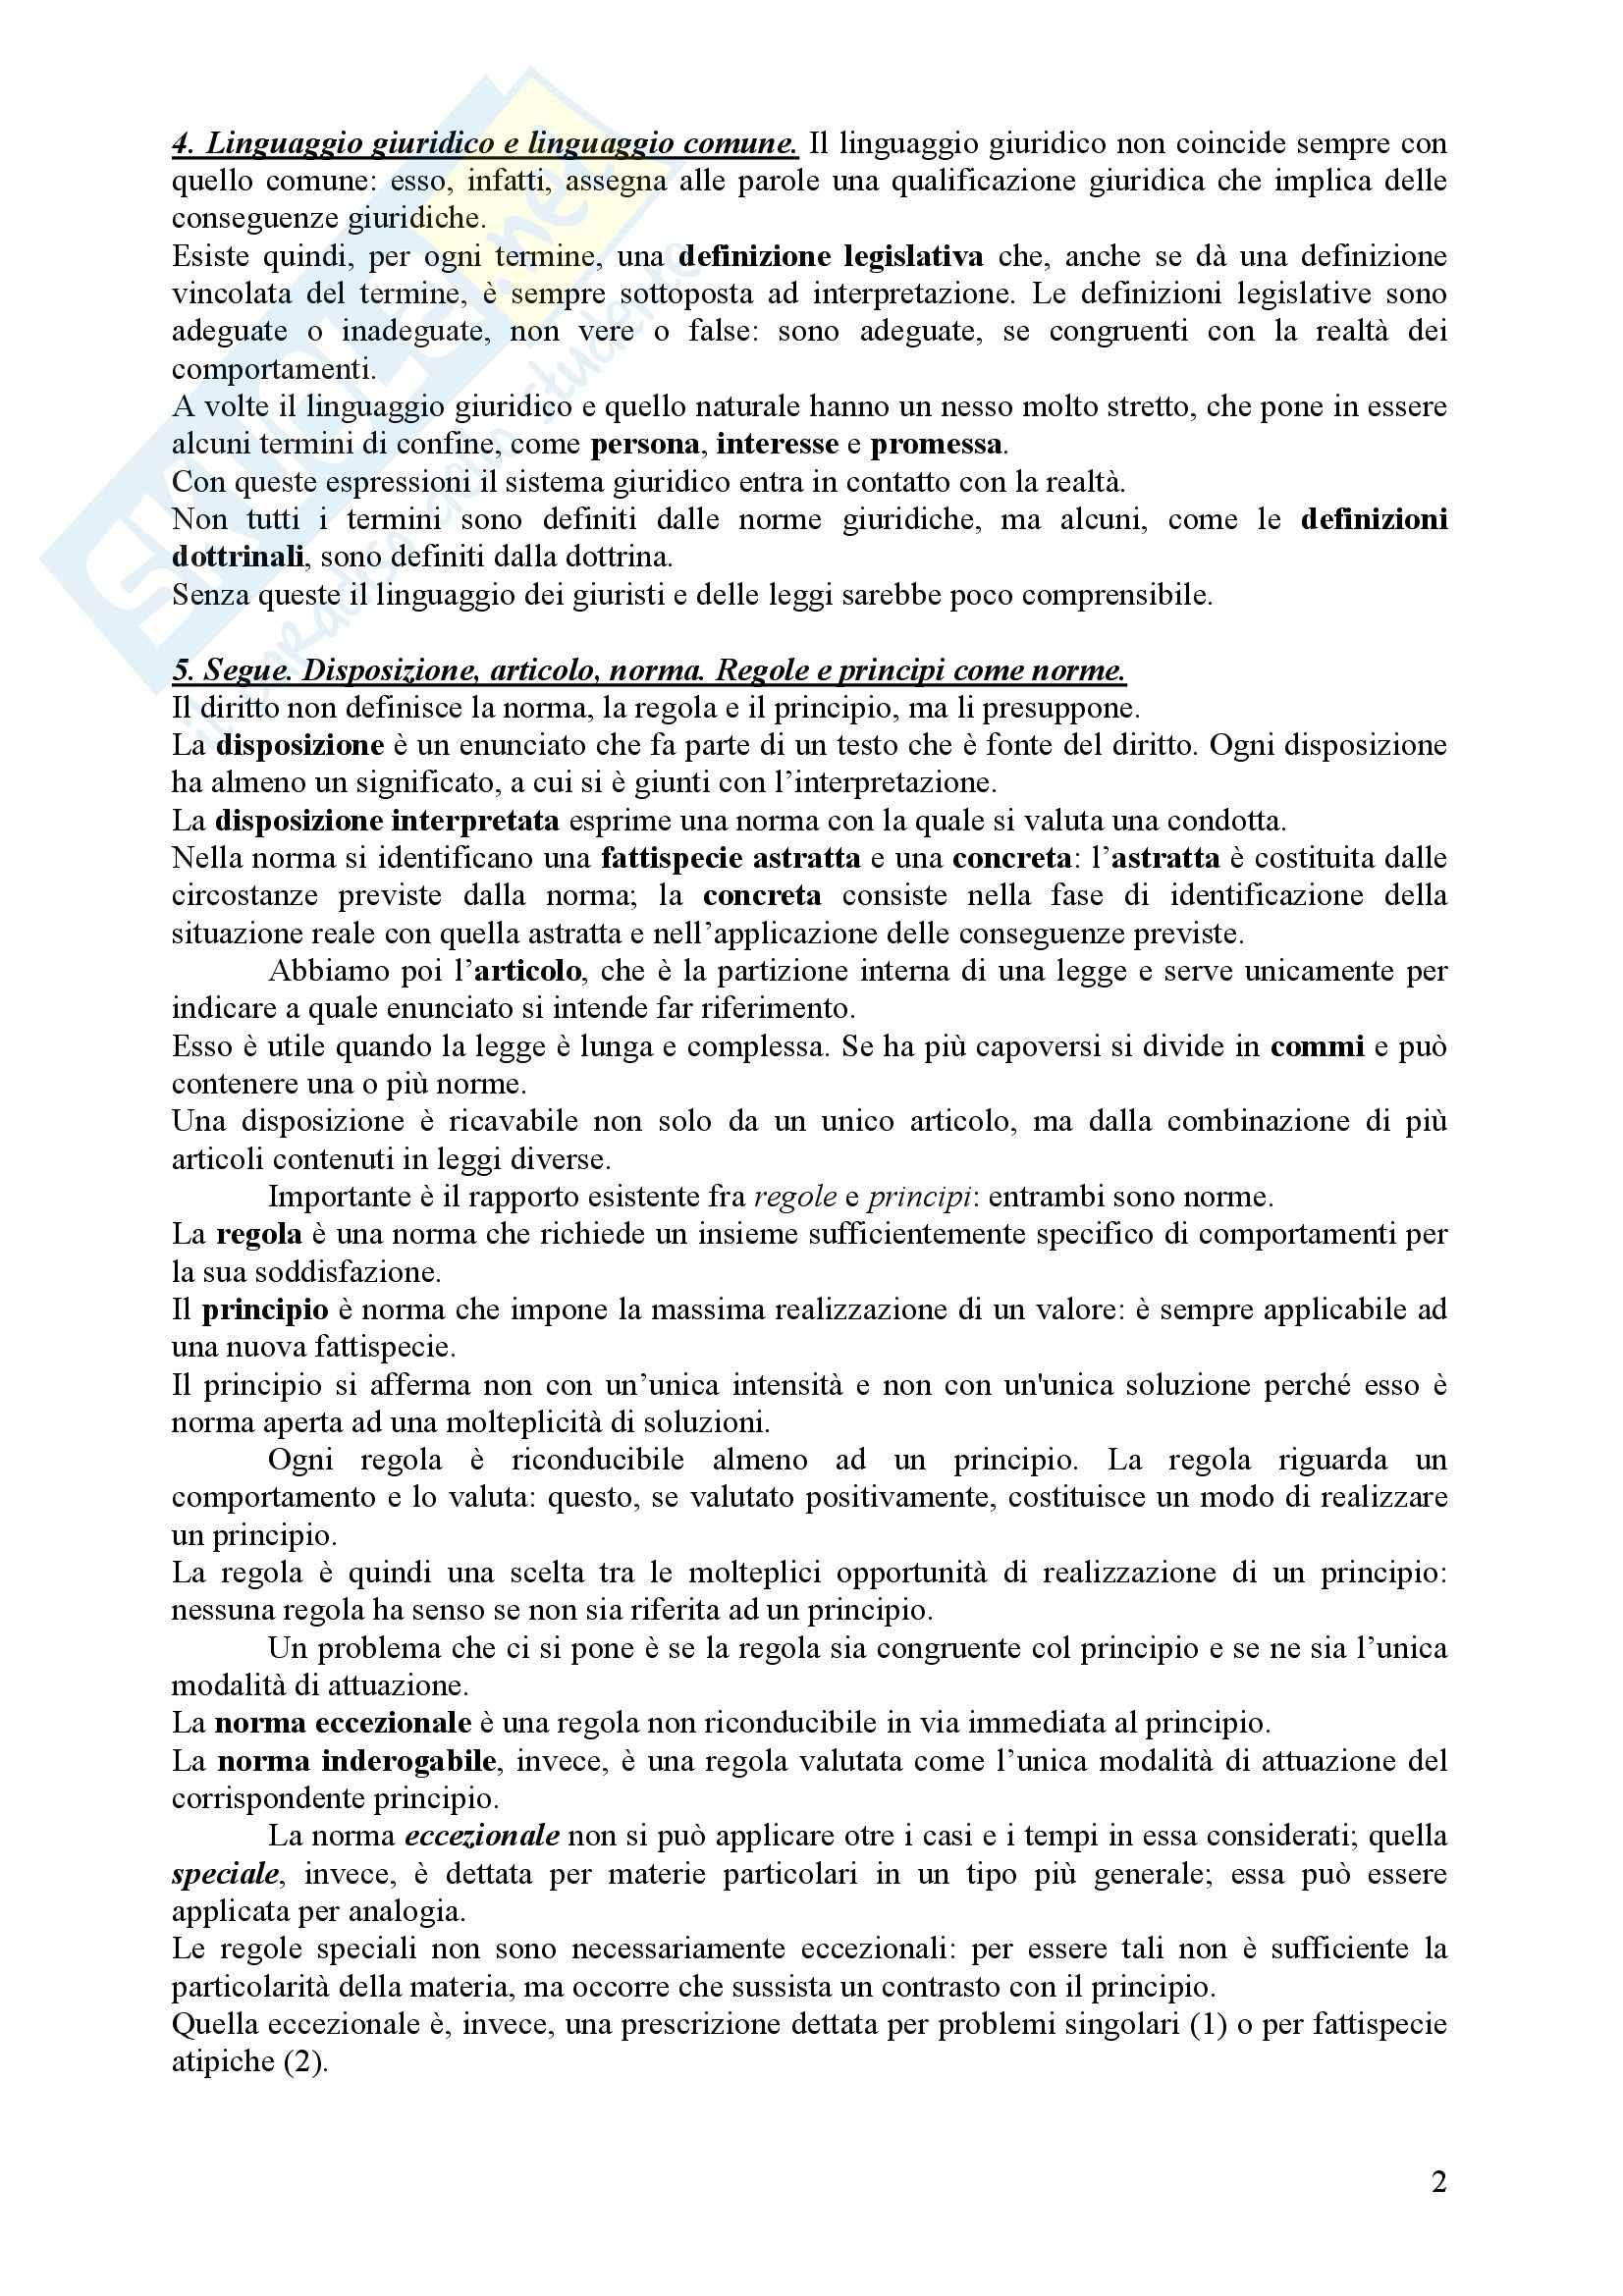 Diritto Civile - Perlingieri – Parte prima – Riassunto esame Pag. 2